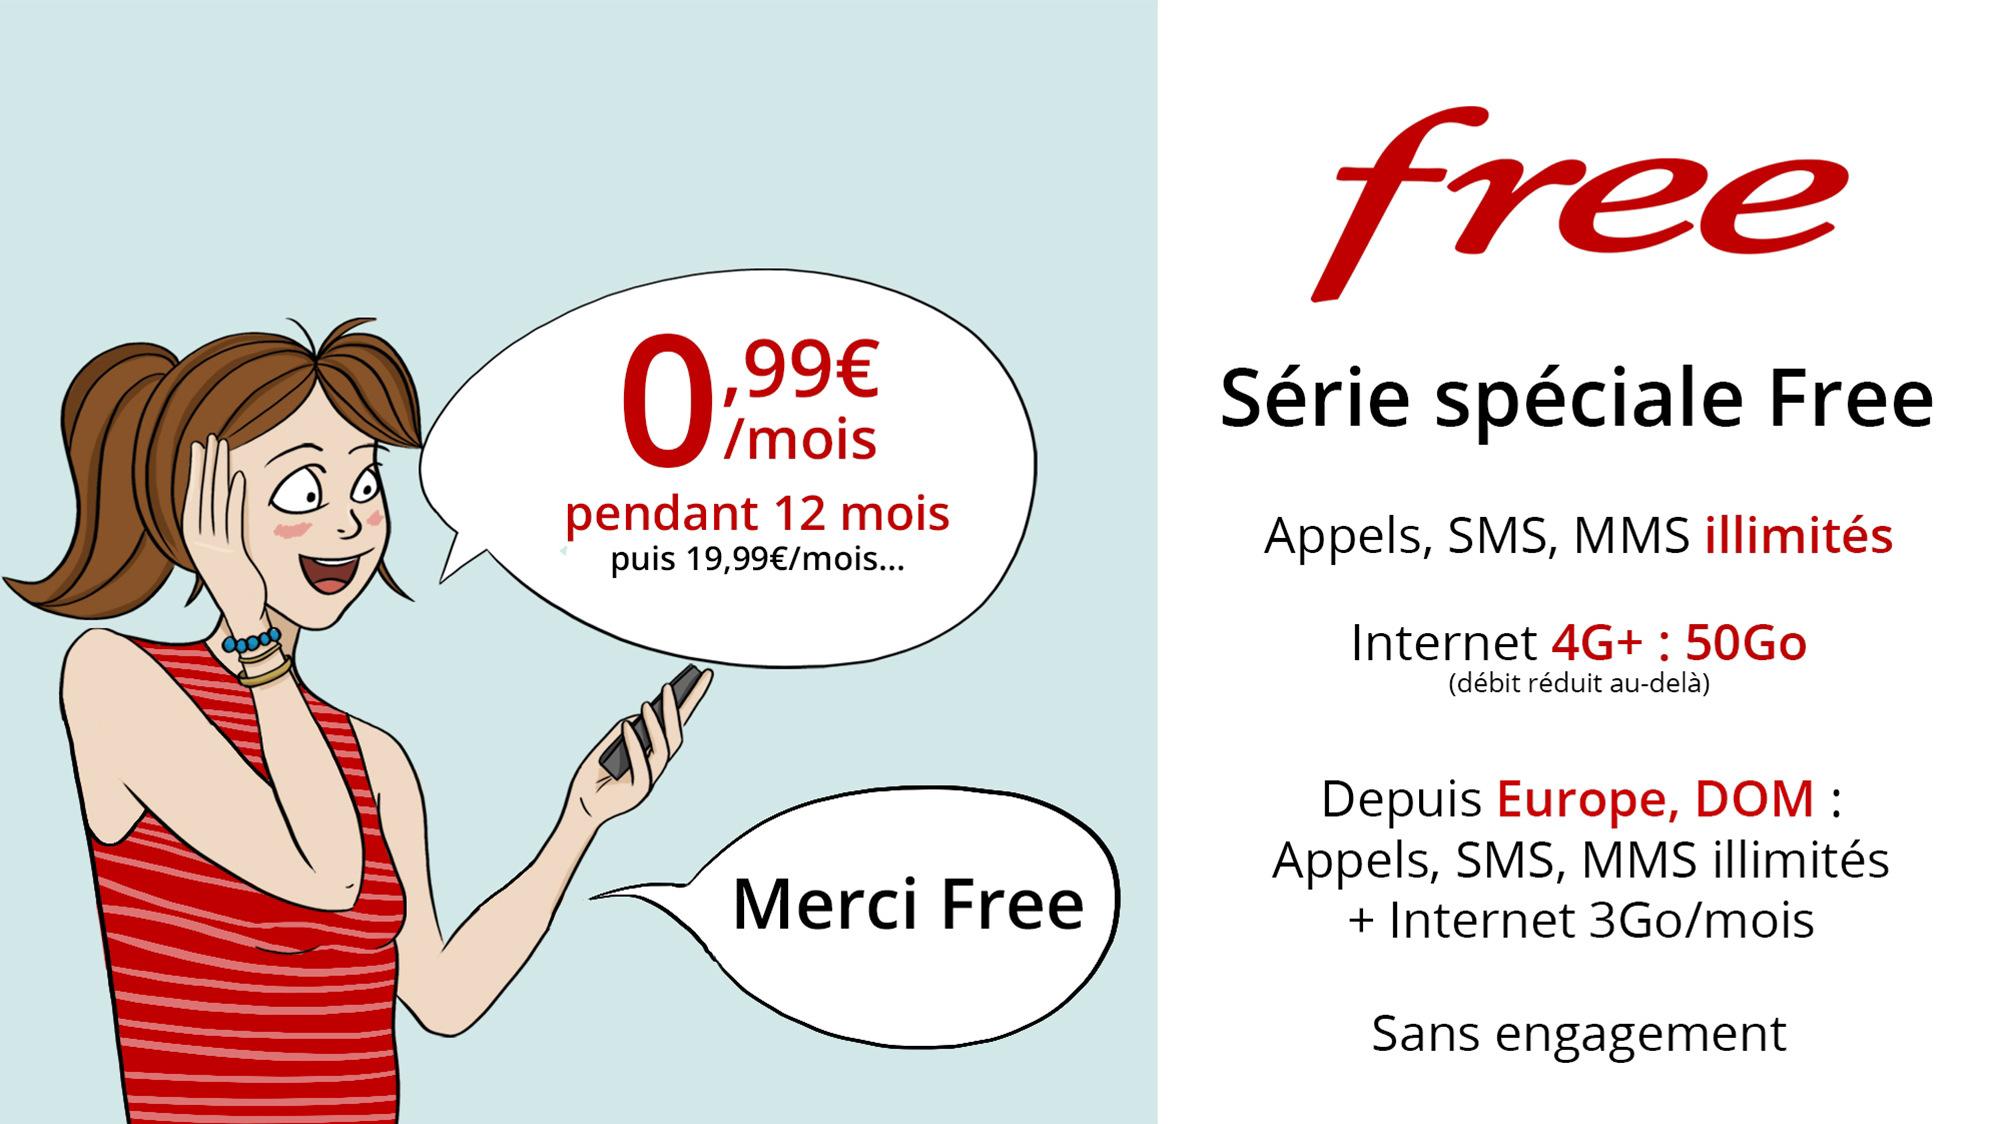 vente priv?e free mobile septembre 2018